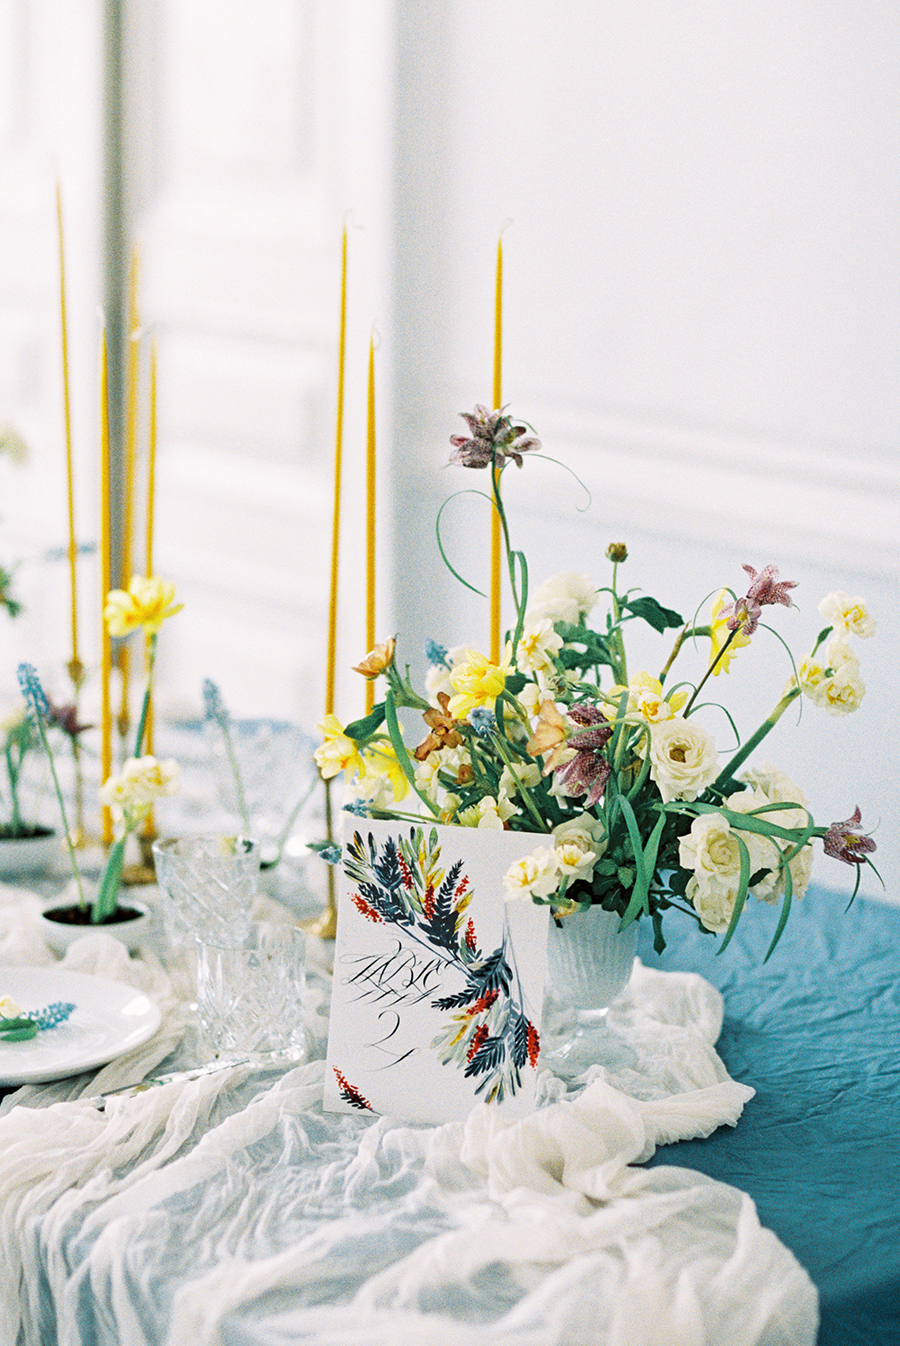 yellow and blue weddings - photo by Igor Kovchegin Photography http://ruffledblog.com/ethereal-wedding-inspiration-with-teal-and-marigold